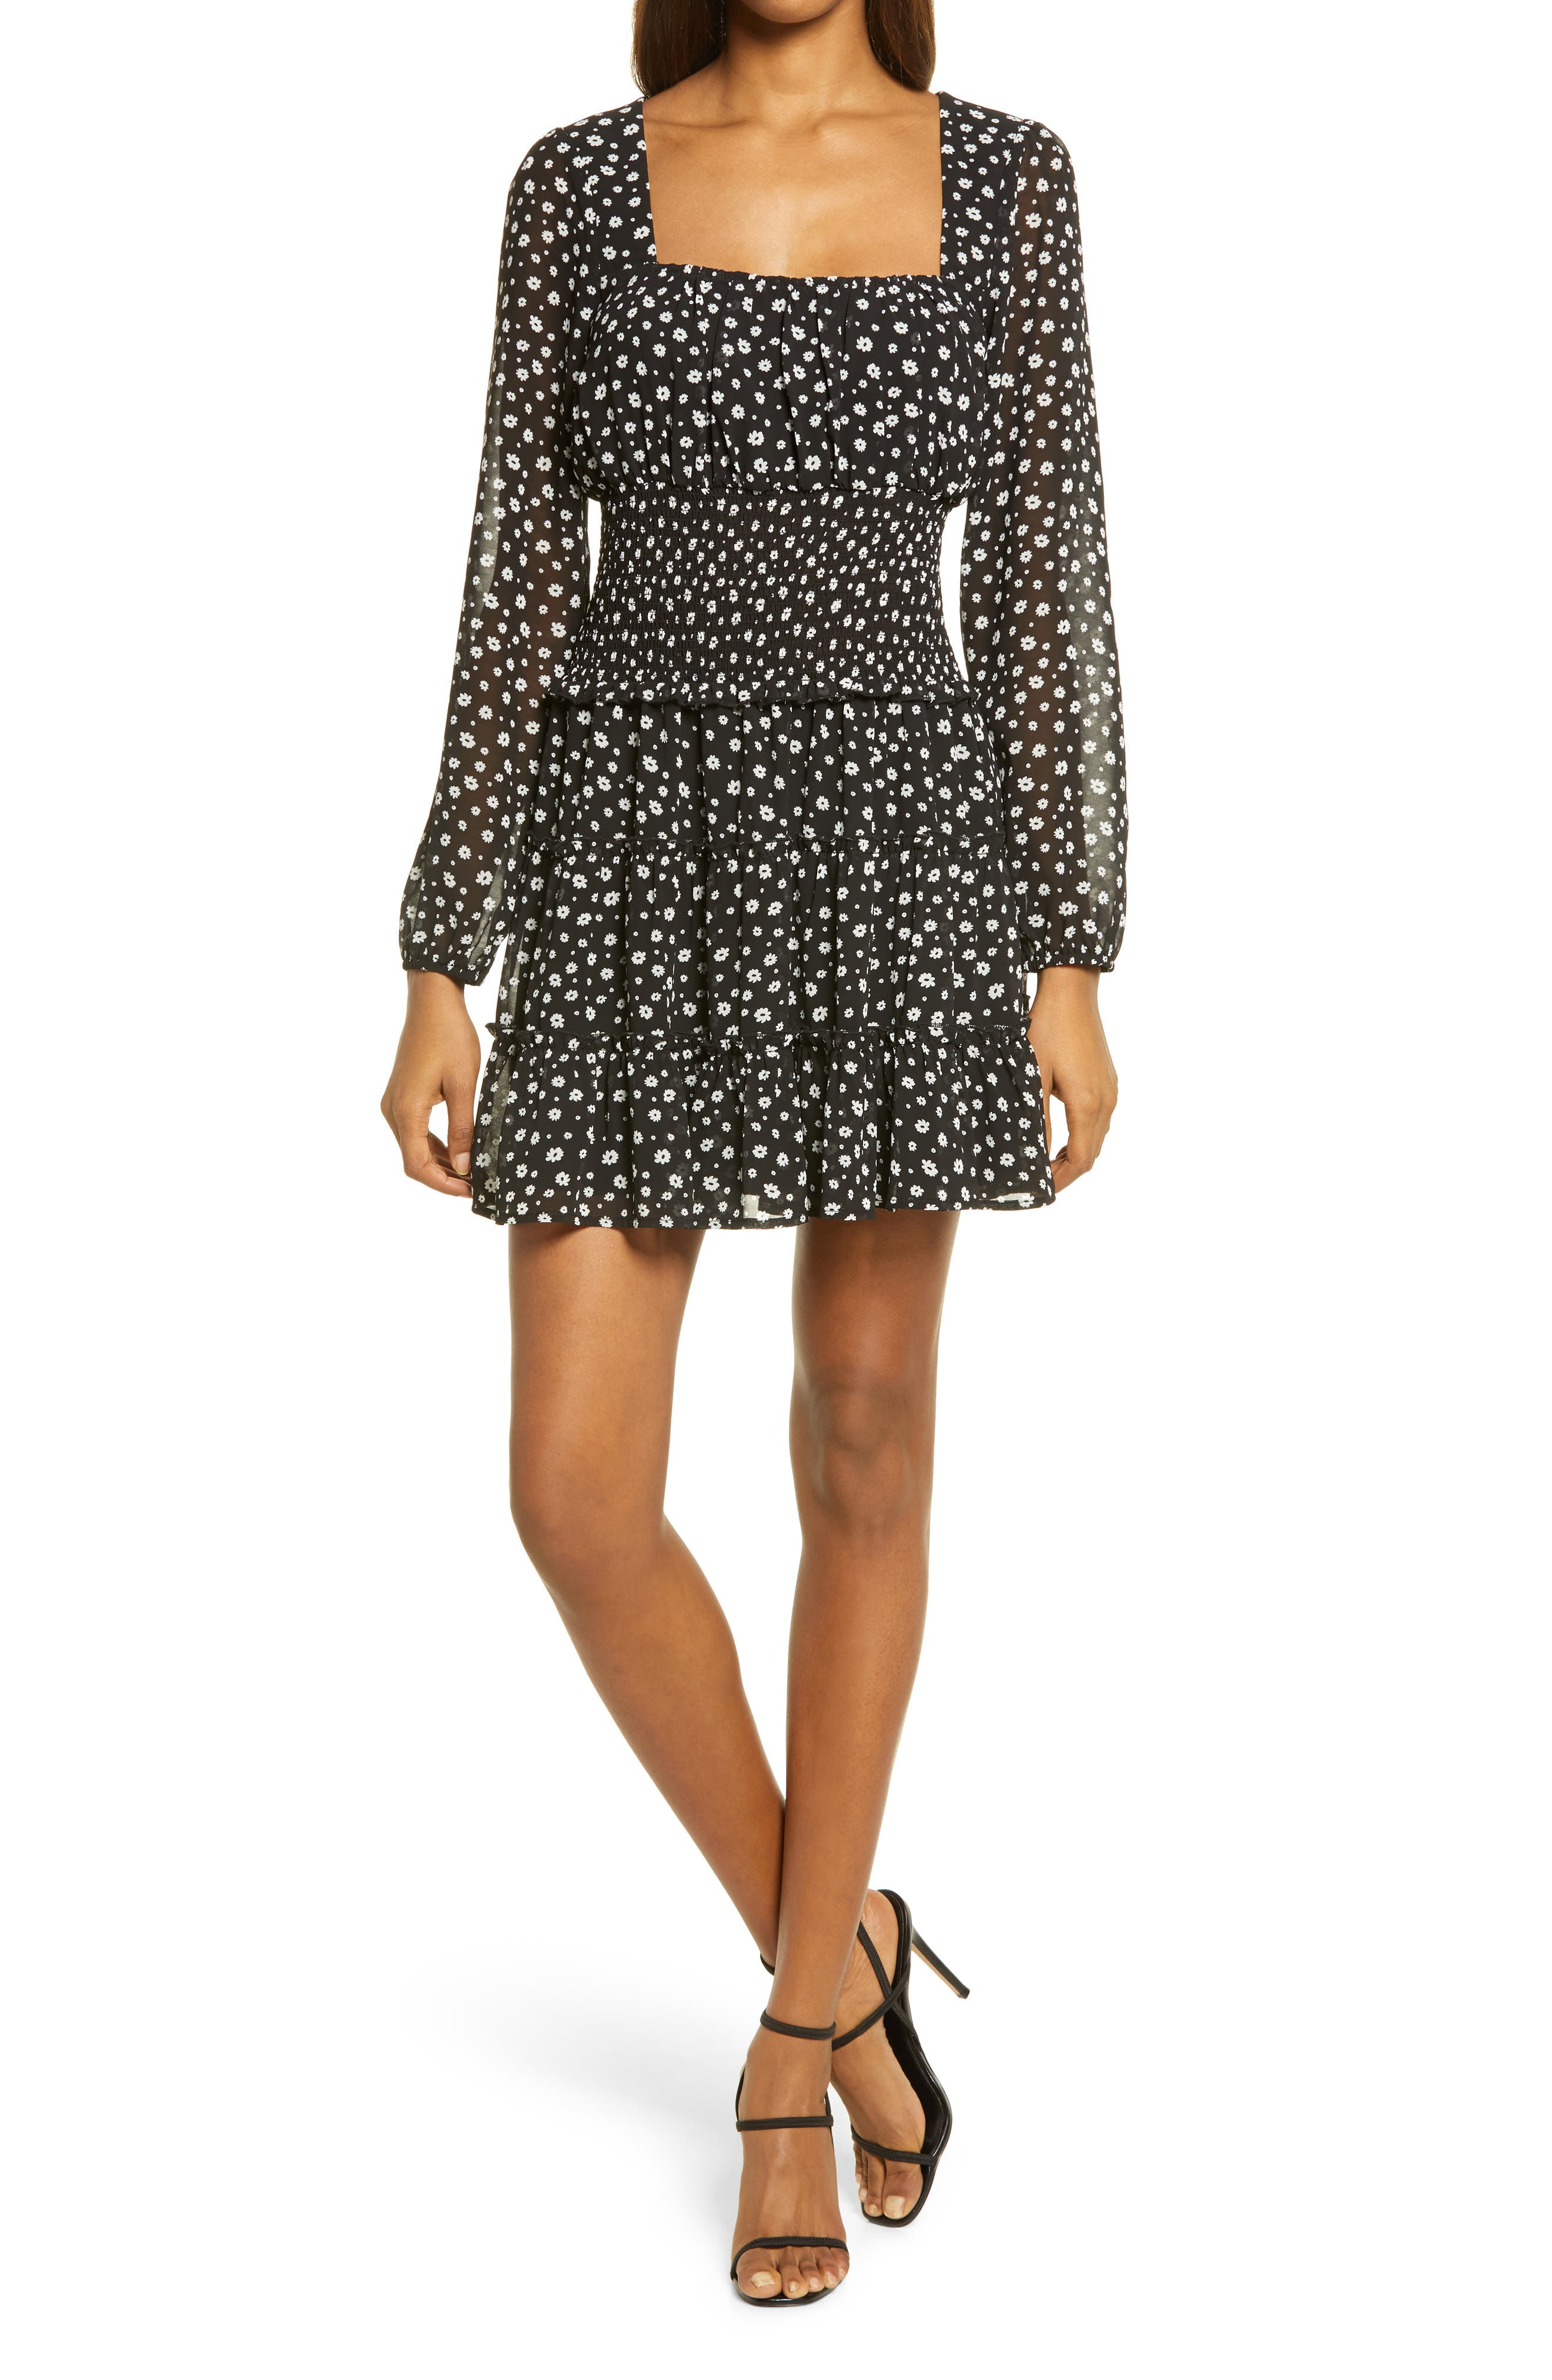 Image of ROW A Smocked Waist Polka Dot Mini Dress